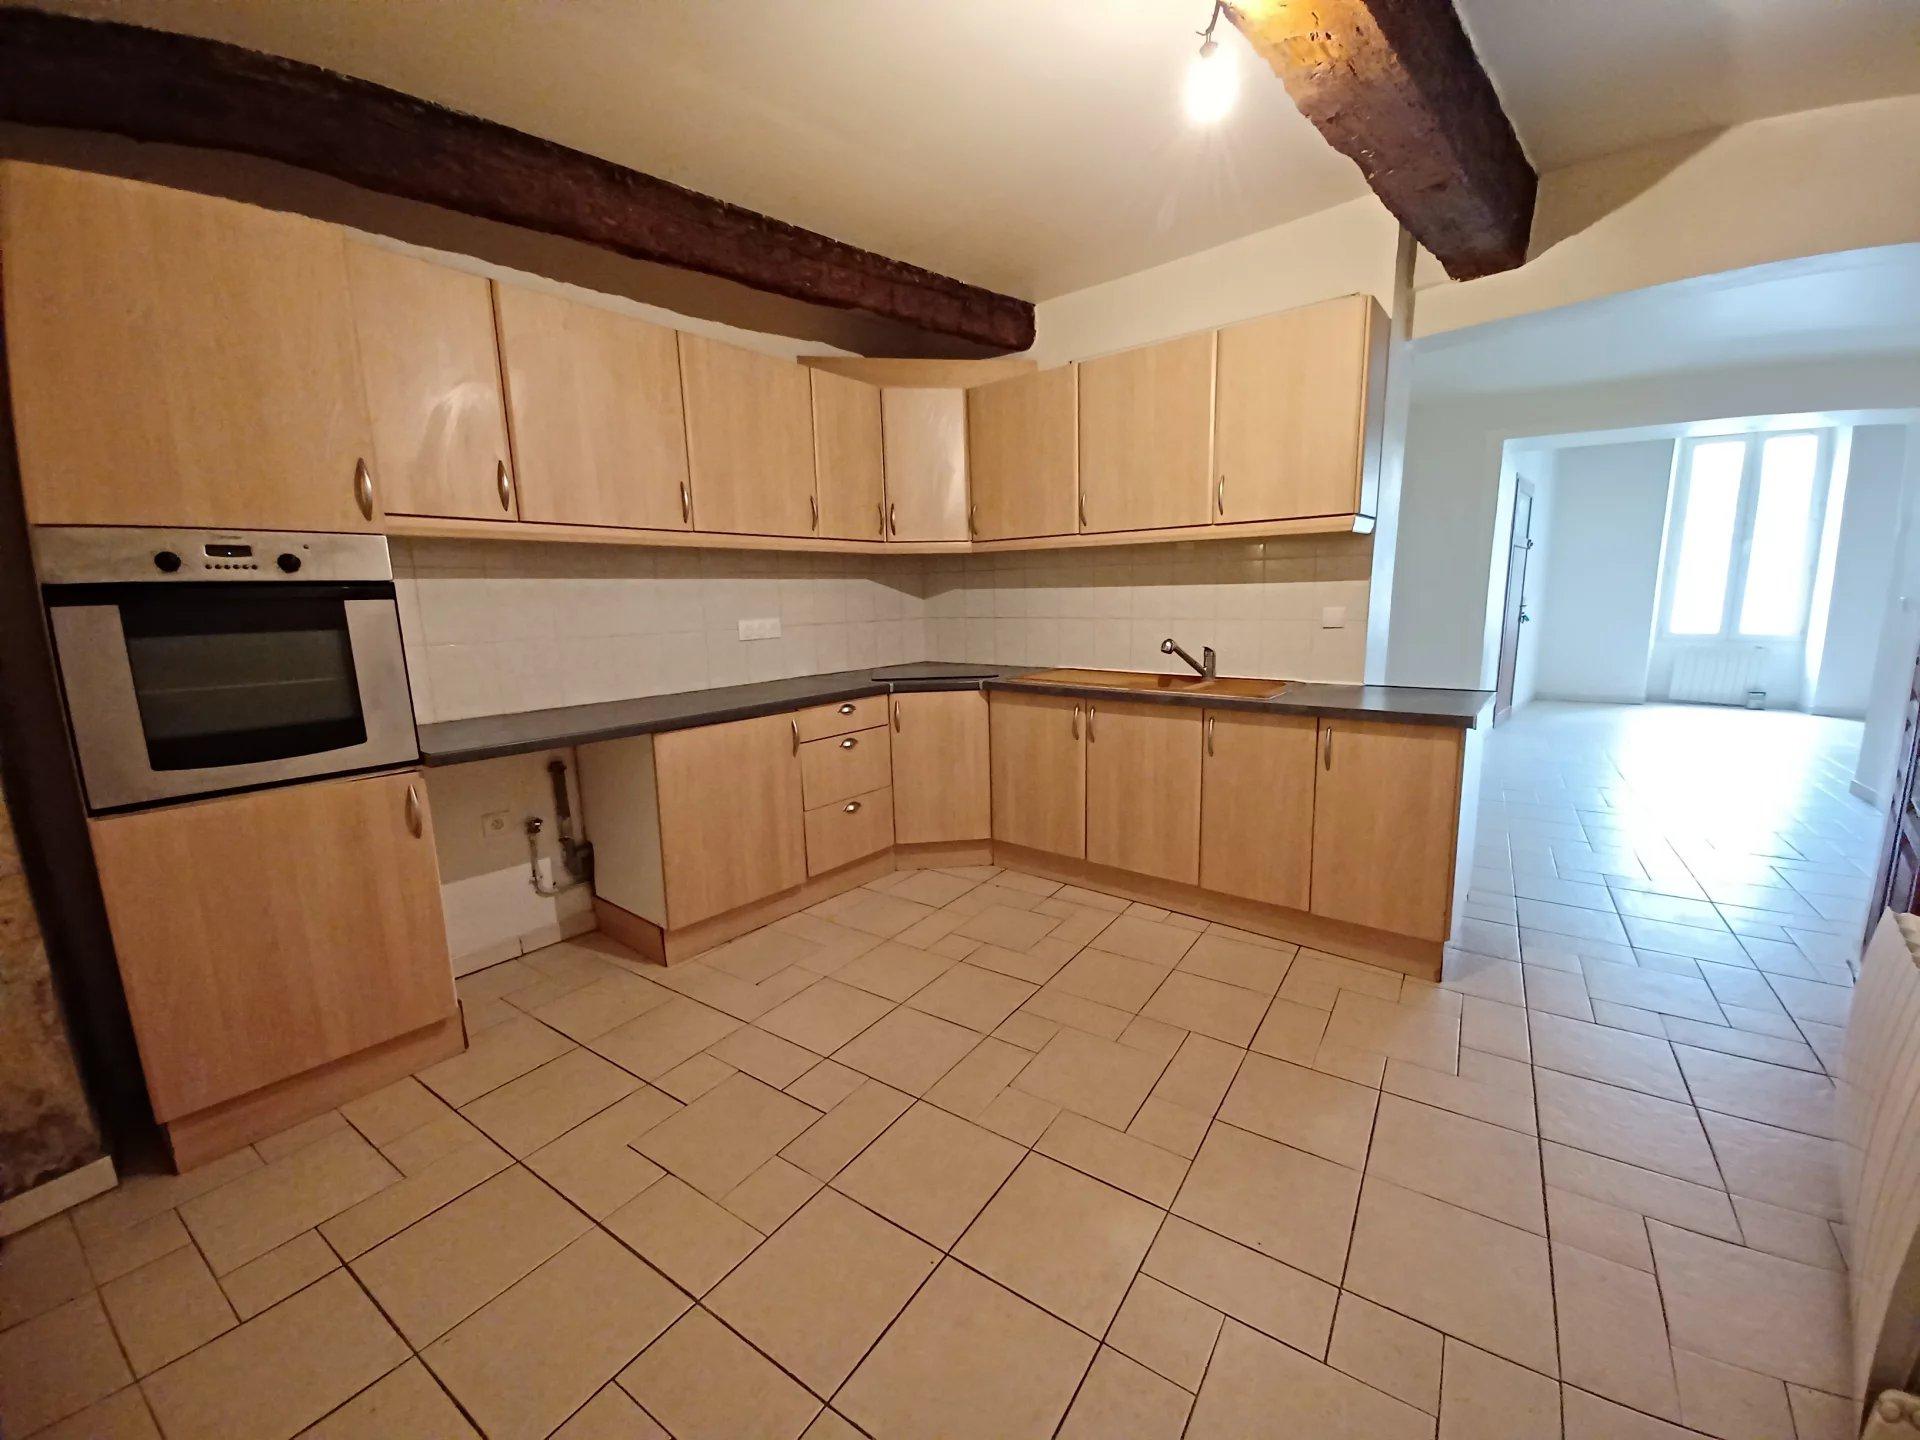 Location Appartement TARASCON surface habitable de 70 m²